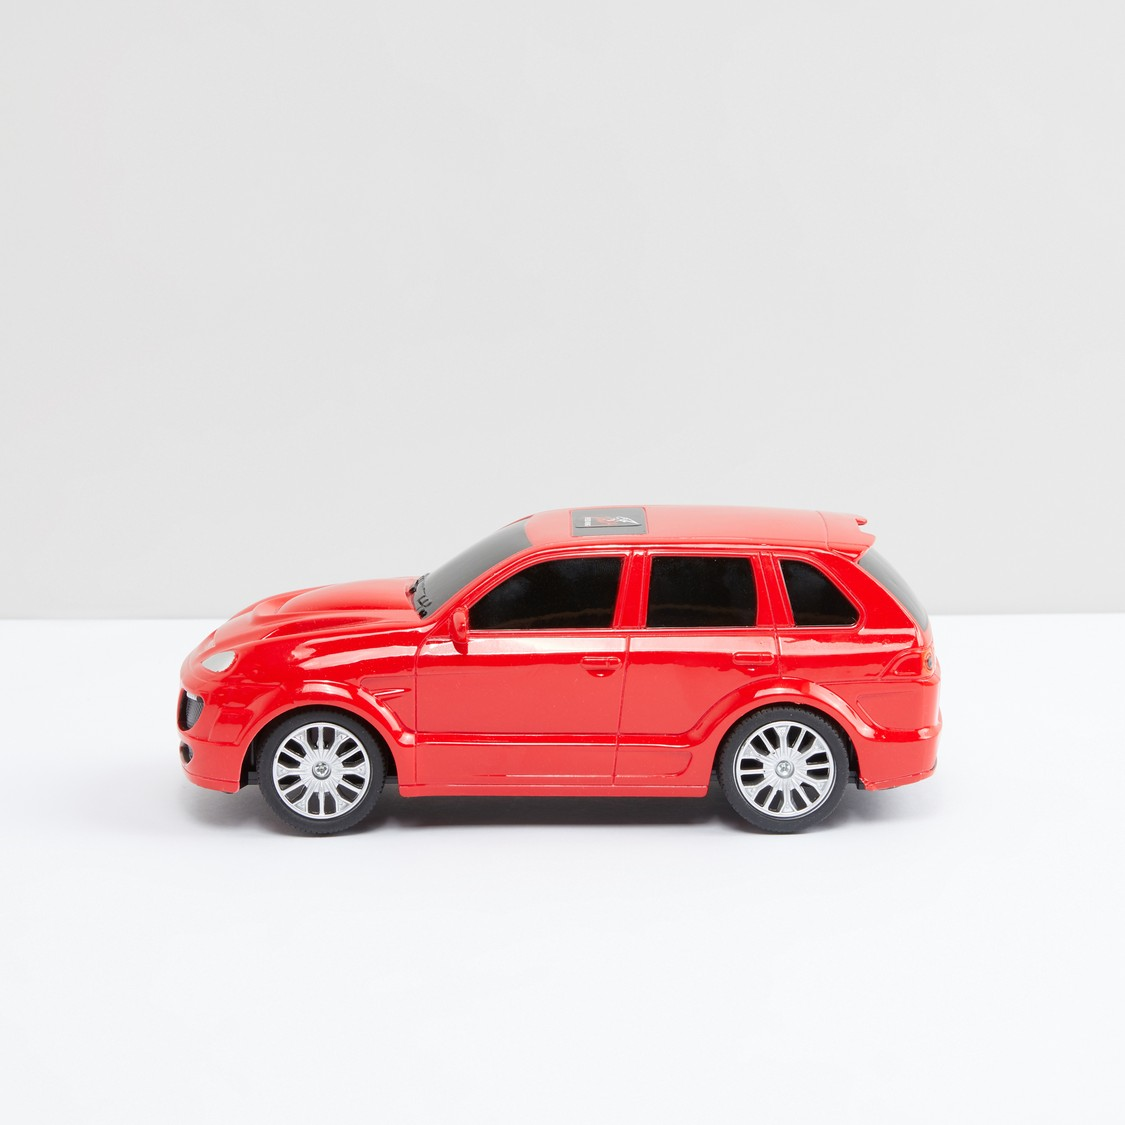 Remote Control 1:18 Scale Car Toy